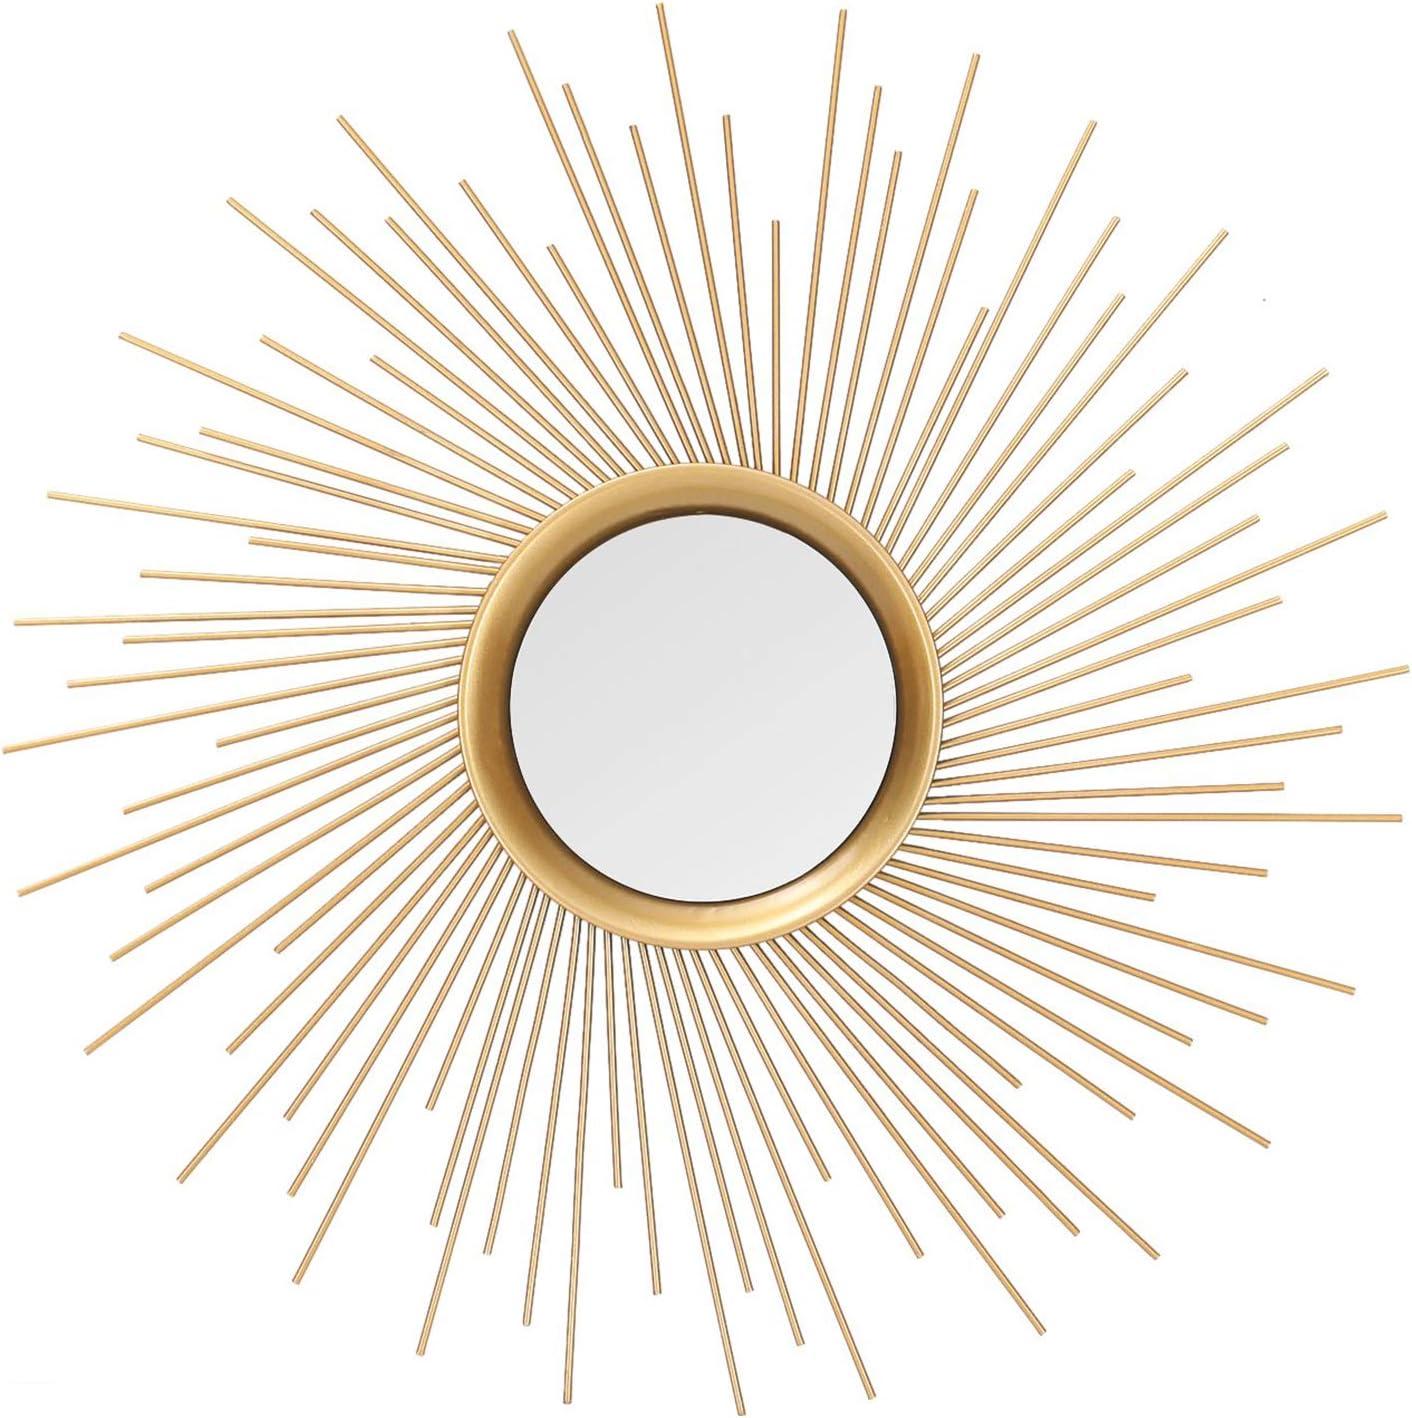 Asense Home Collection Sunburst Classic Mirror Japan's largest assortment Decorative Metal Price reduction